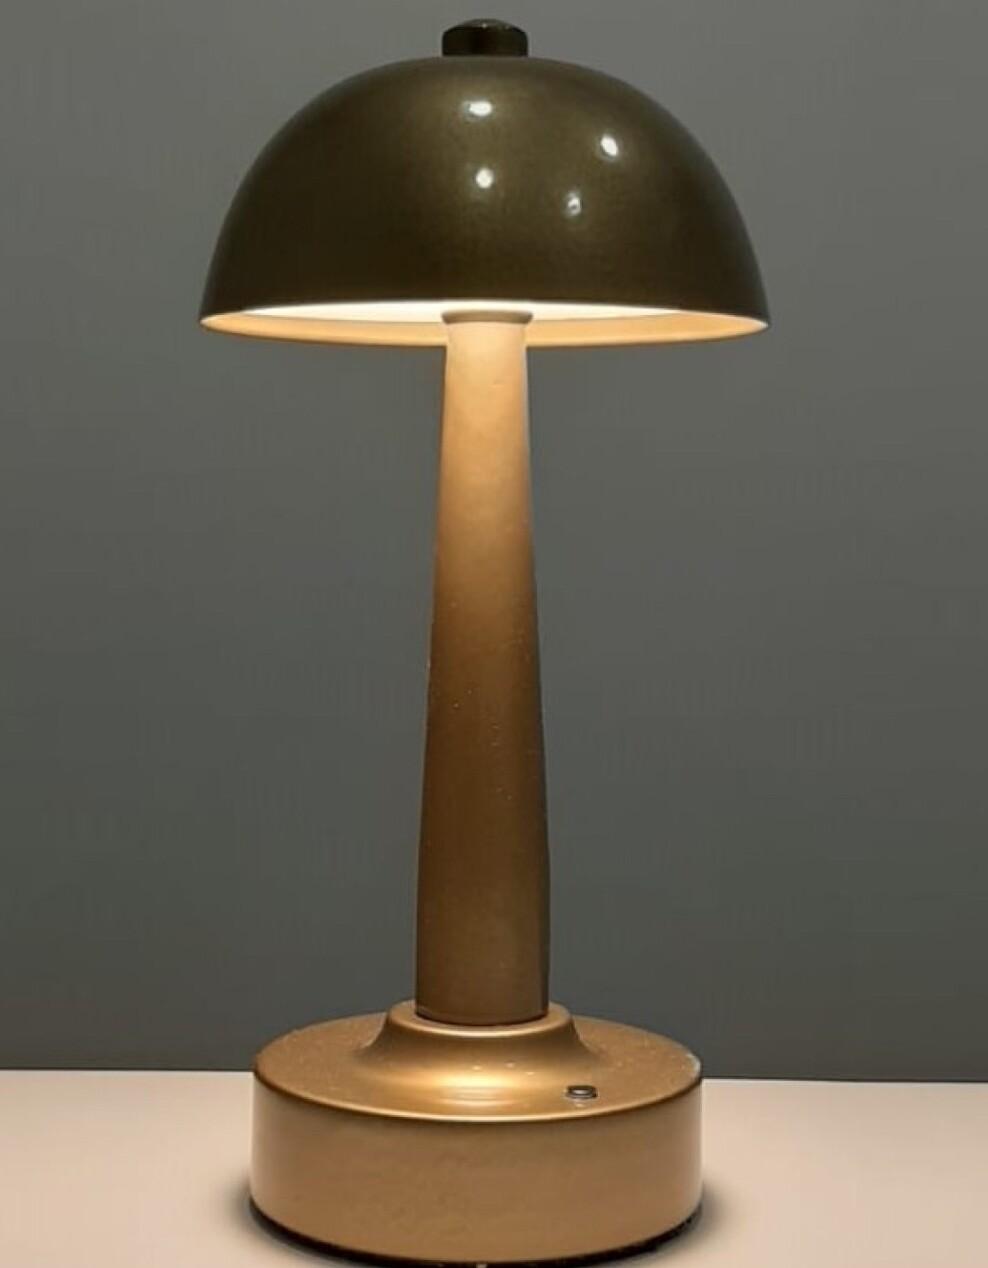 Deck portable Table Lamp, 4W LED, 4000K, 400lm, IP44, Antique